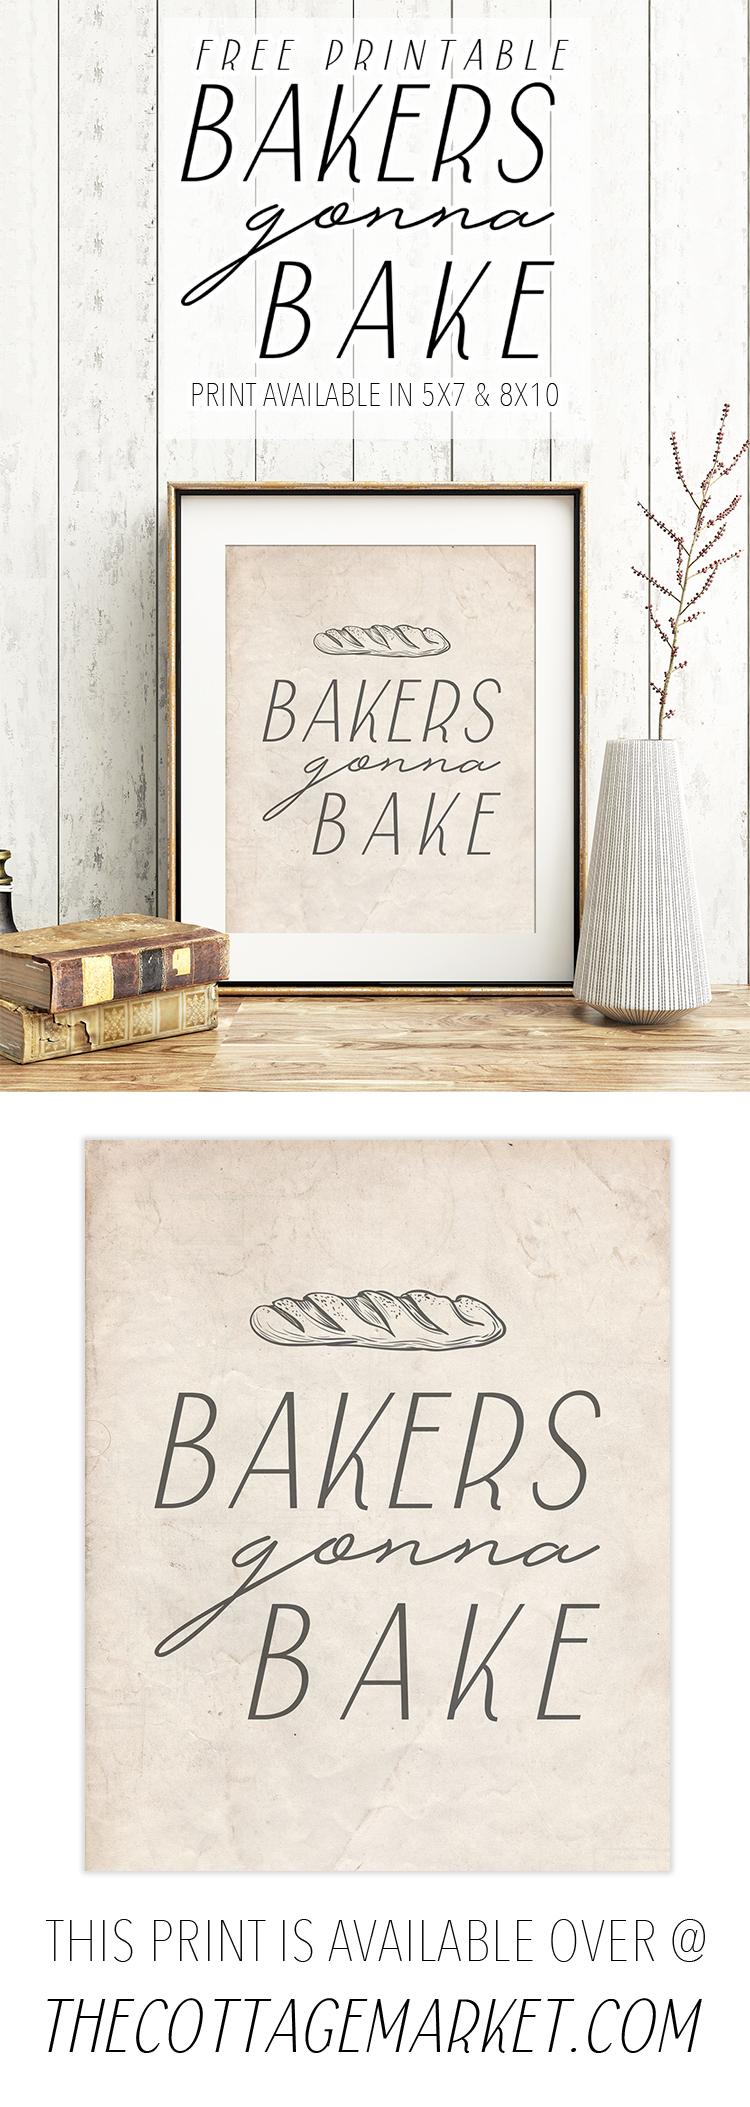 http://thecottagemarket.com/wp-content/uploads/2017/01/TCM-BakersGonnaBake-TOWER.jpg